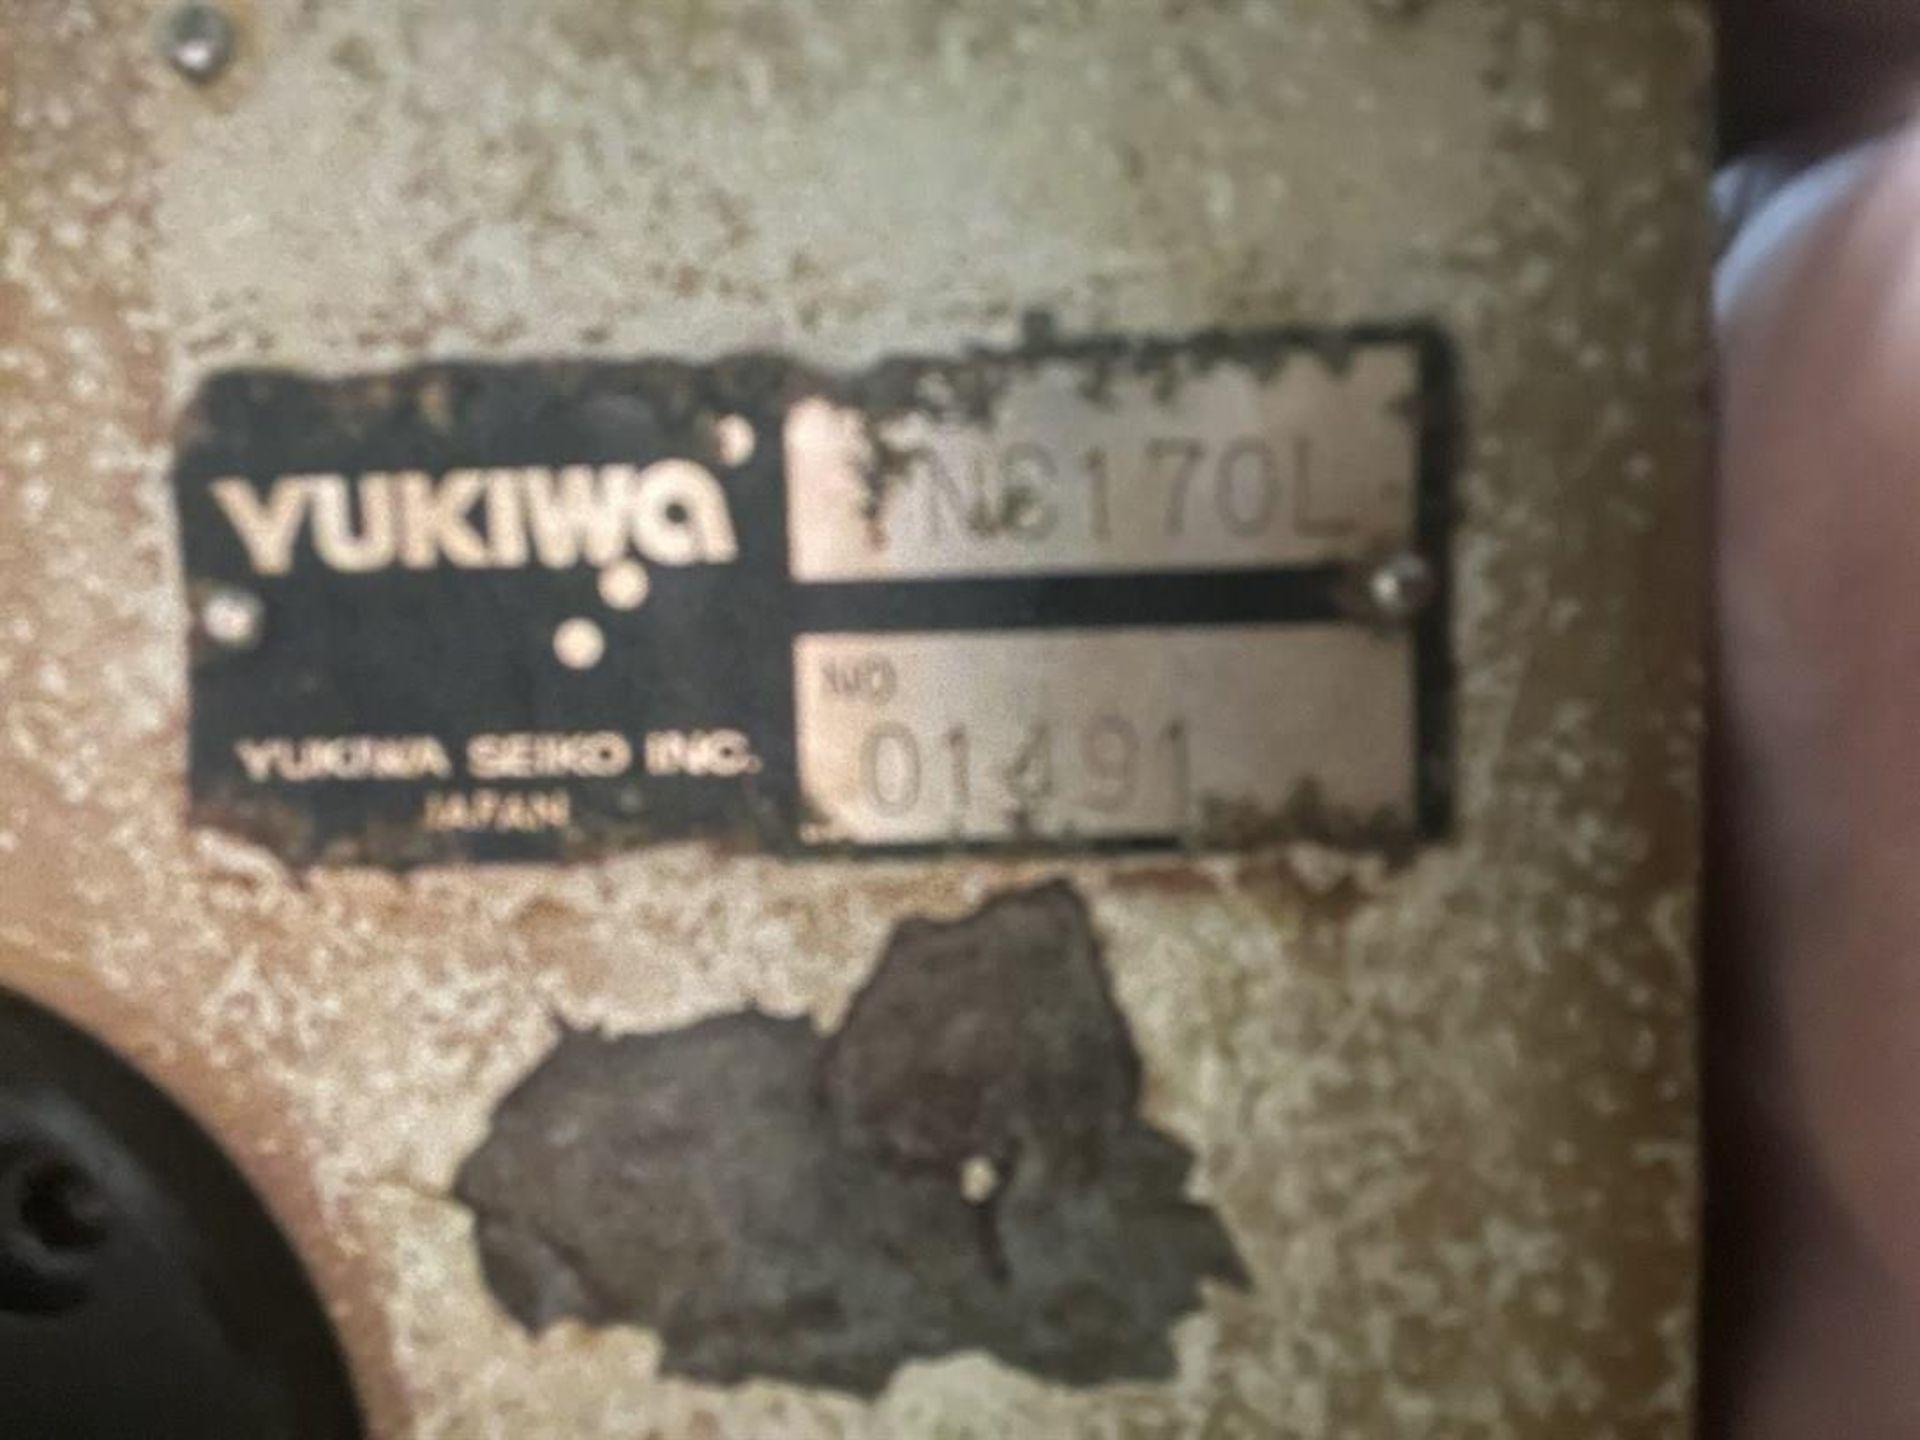 YUKIWA UNC170L Rotary Table, s/n 01491 - Image 3 of 3